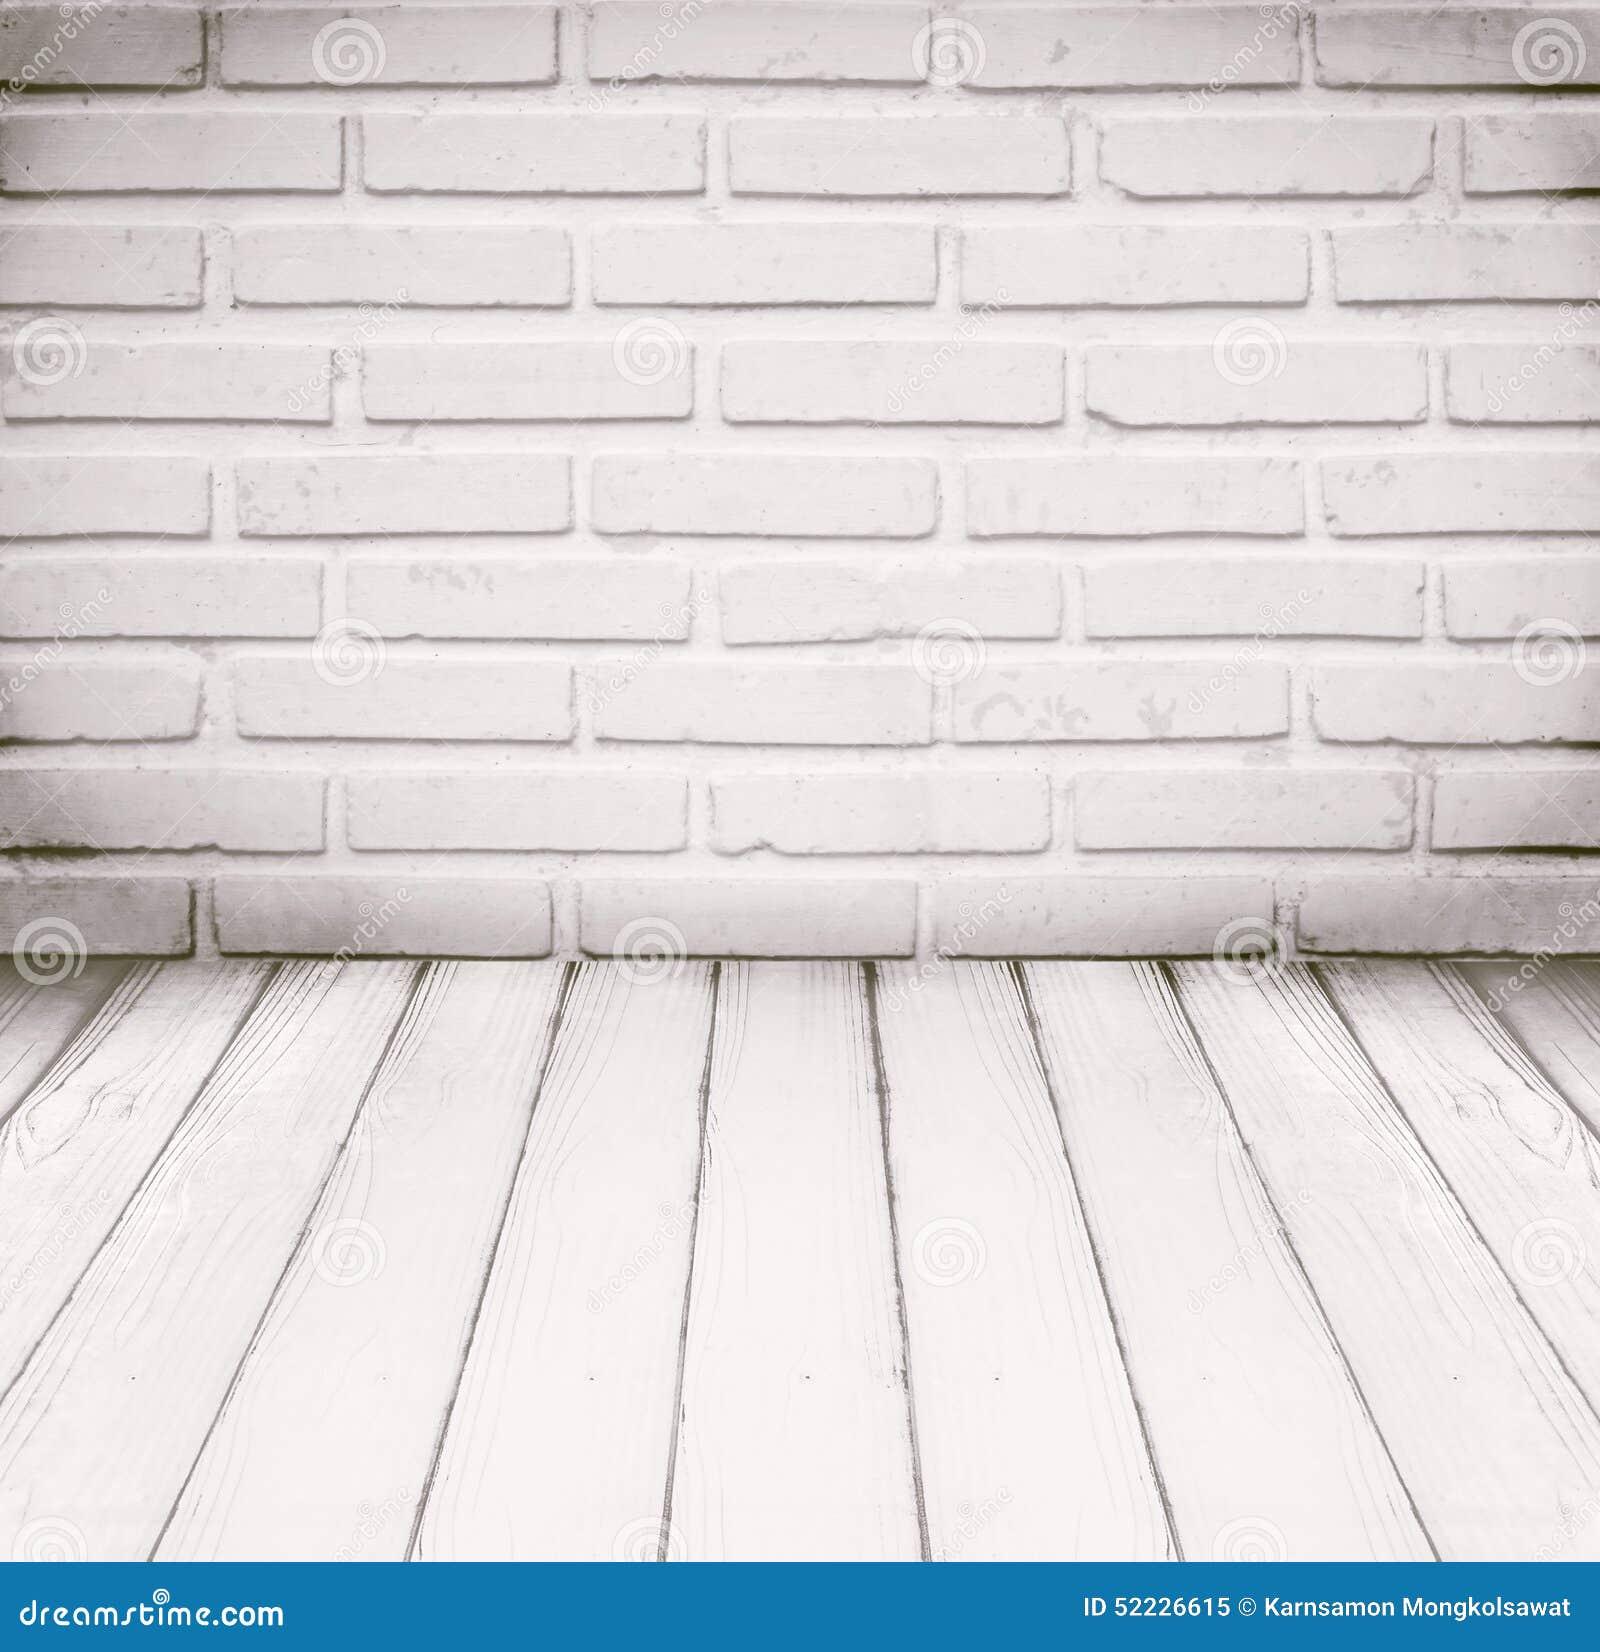 white wood floor background. White Room, Brick Wall And Wood Floor For Background